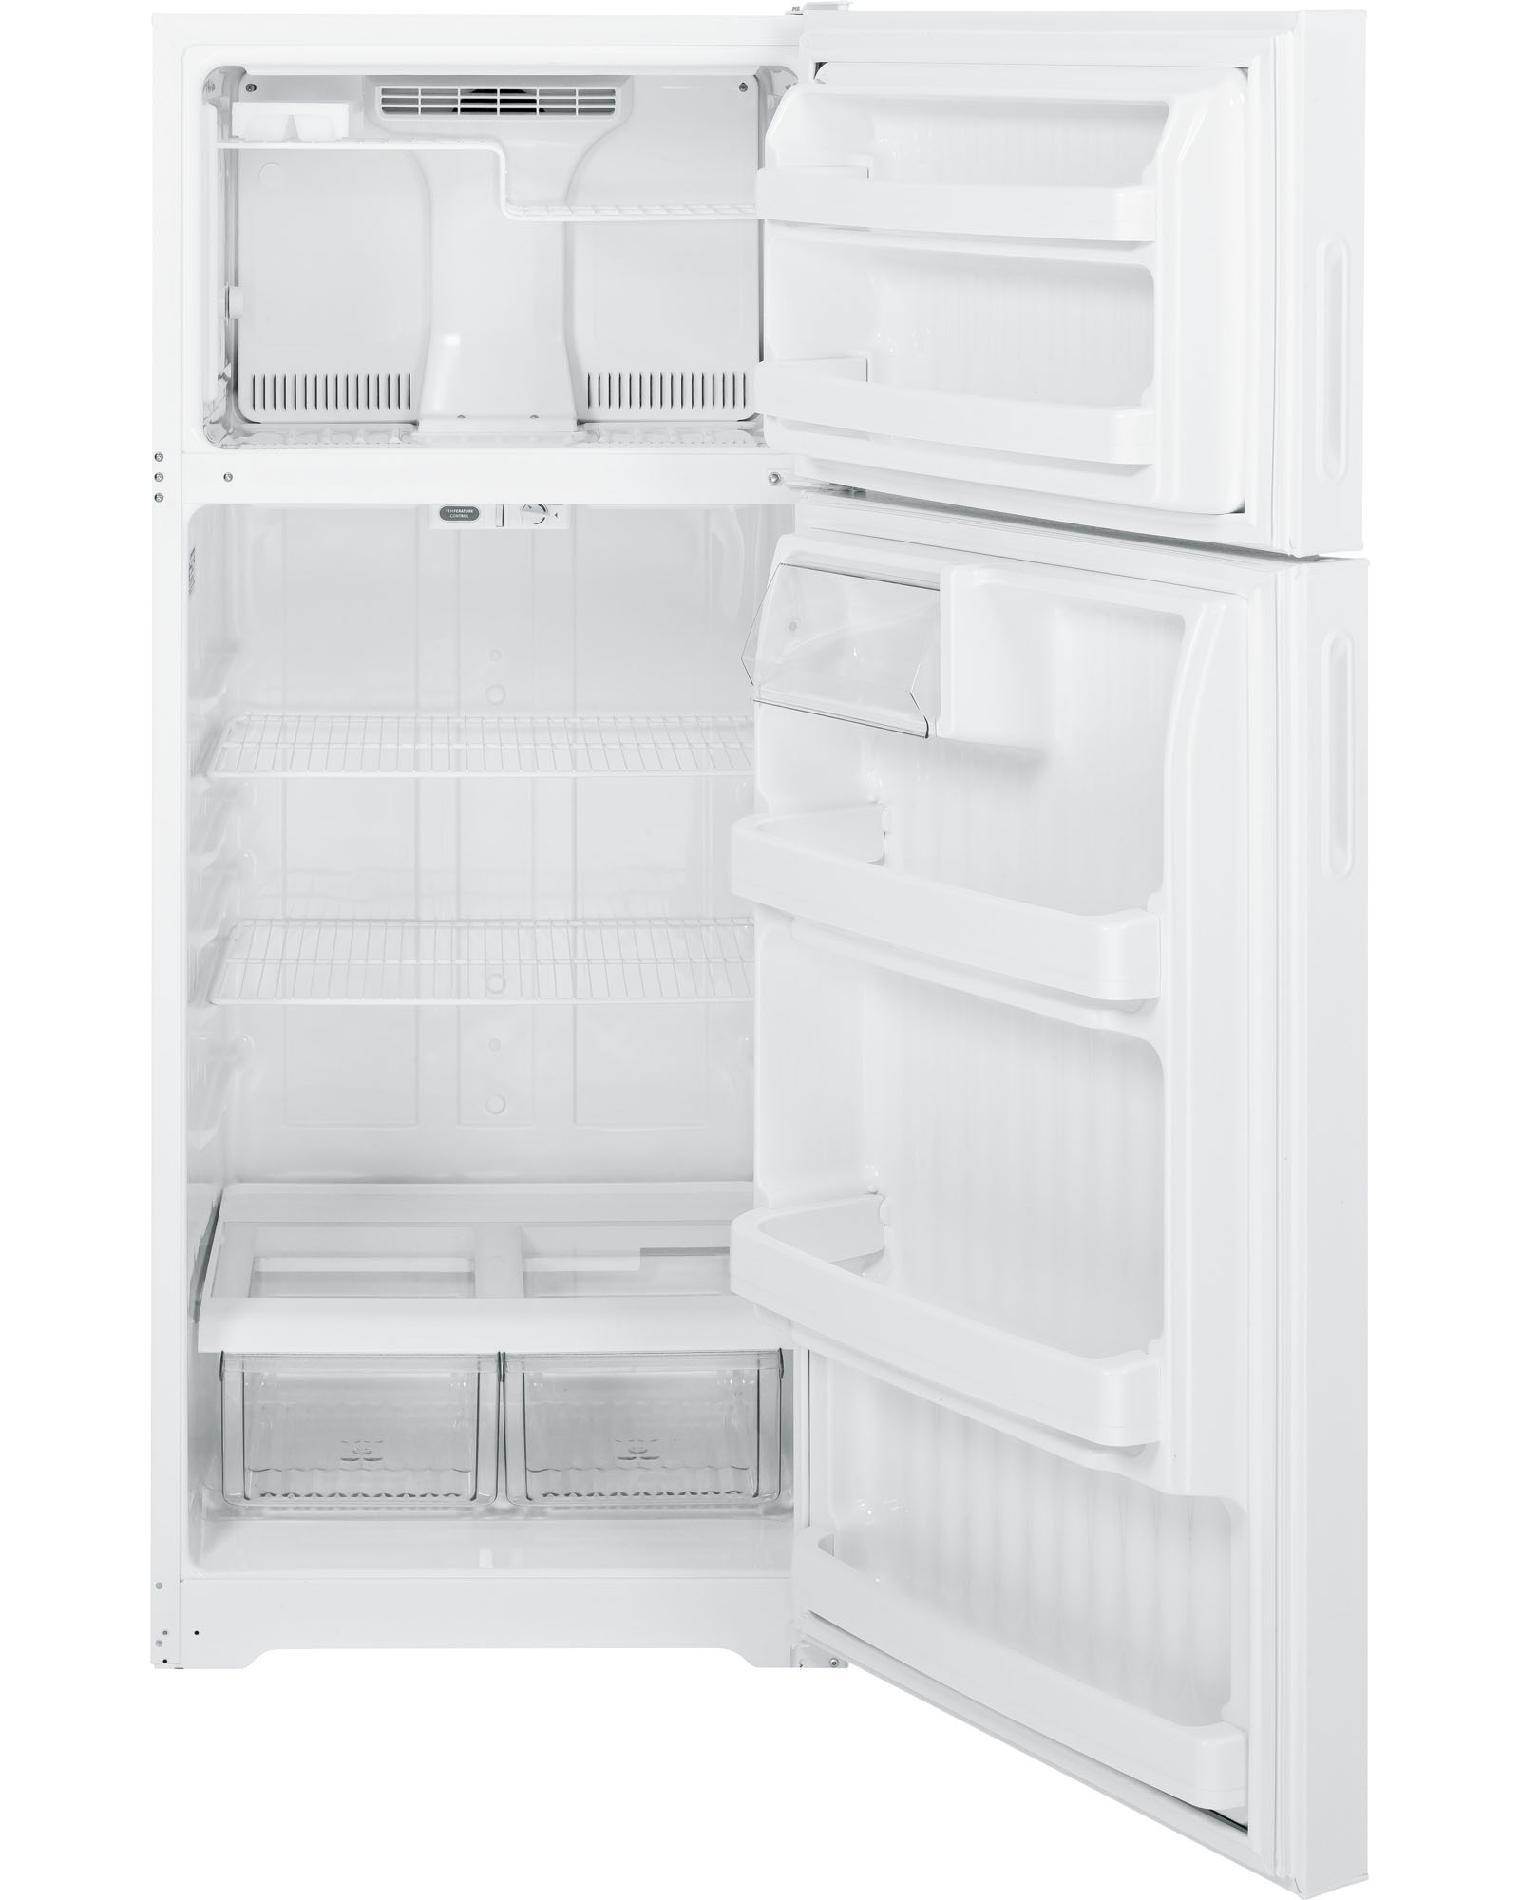 GE 18.1 cu. ft. Top-Freezer Refrigerator - White